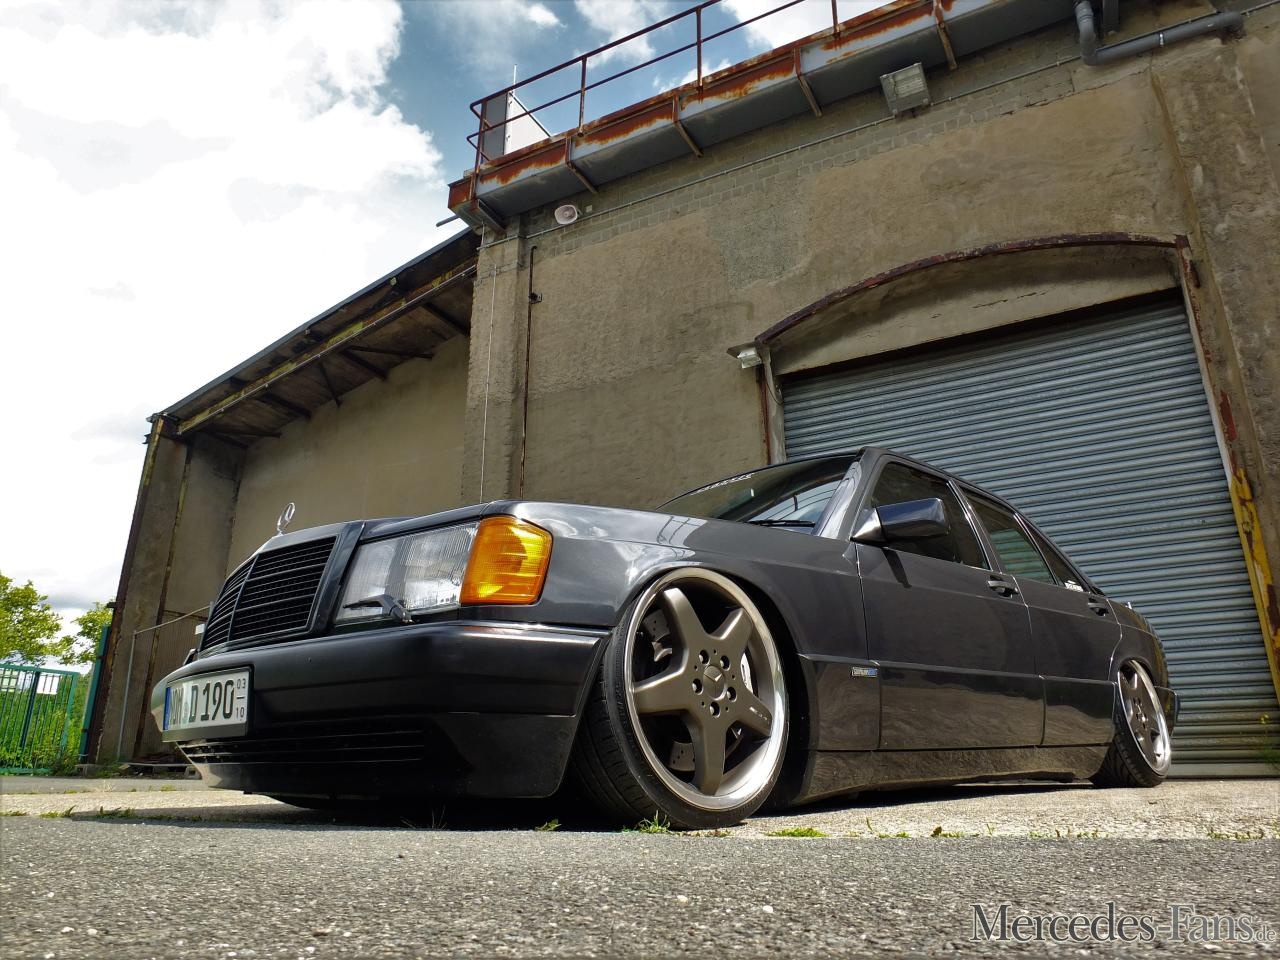 Let it low 91er mercedes benz 190 bagged baby benz for Mercedes benz fans